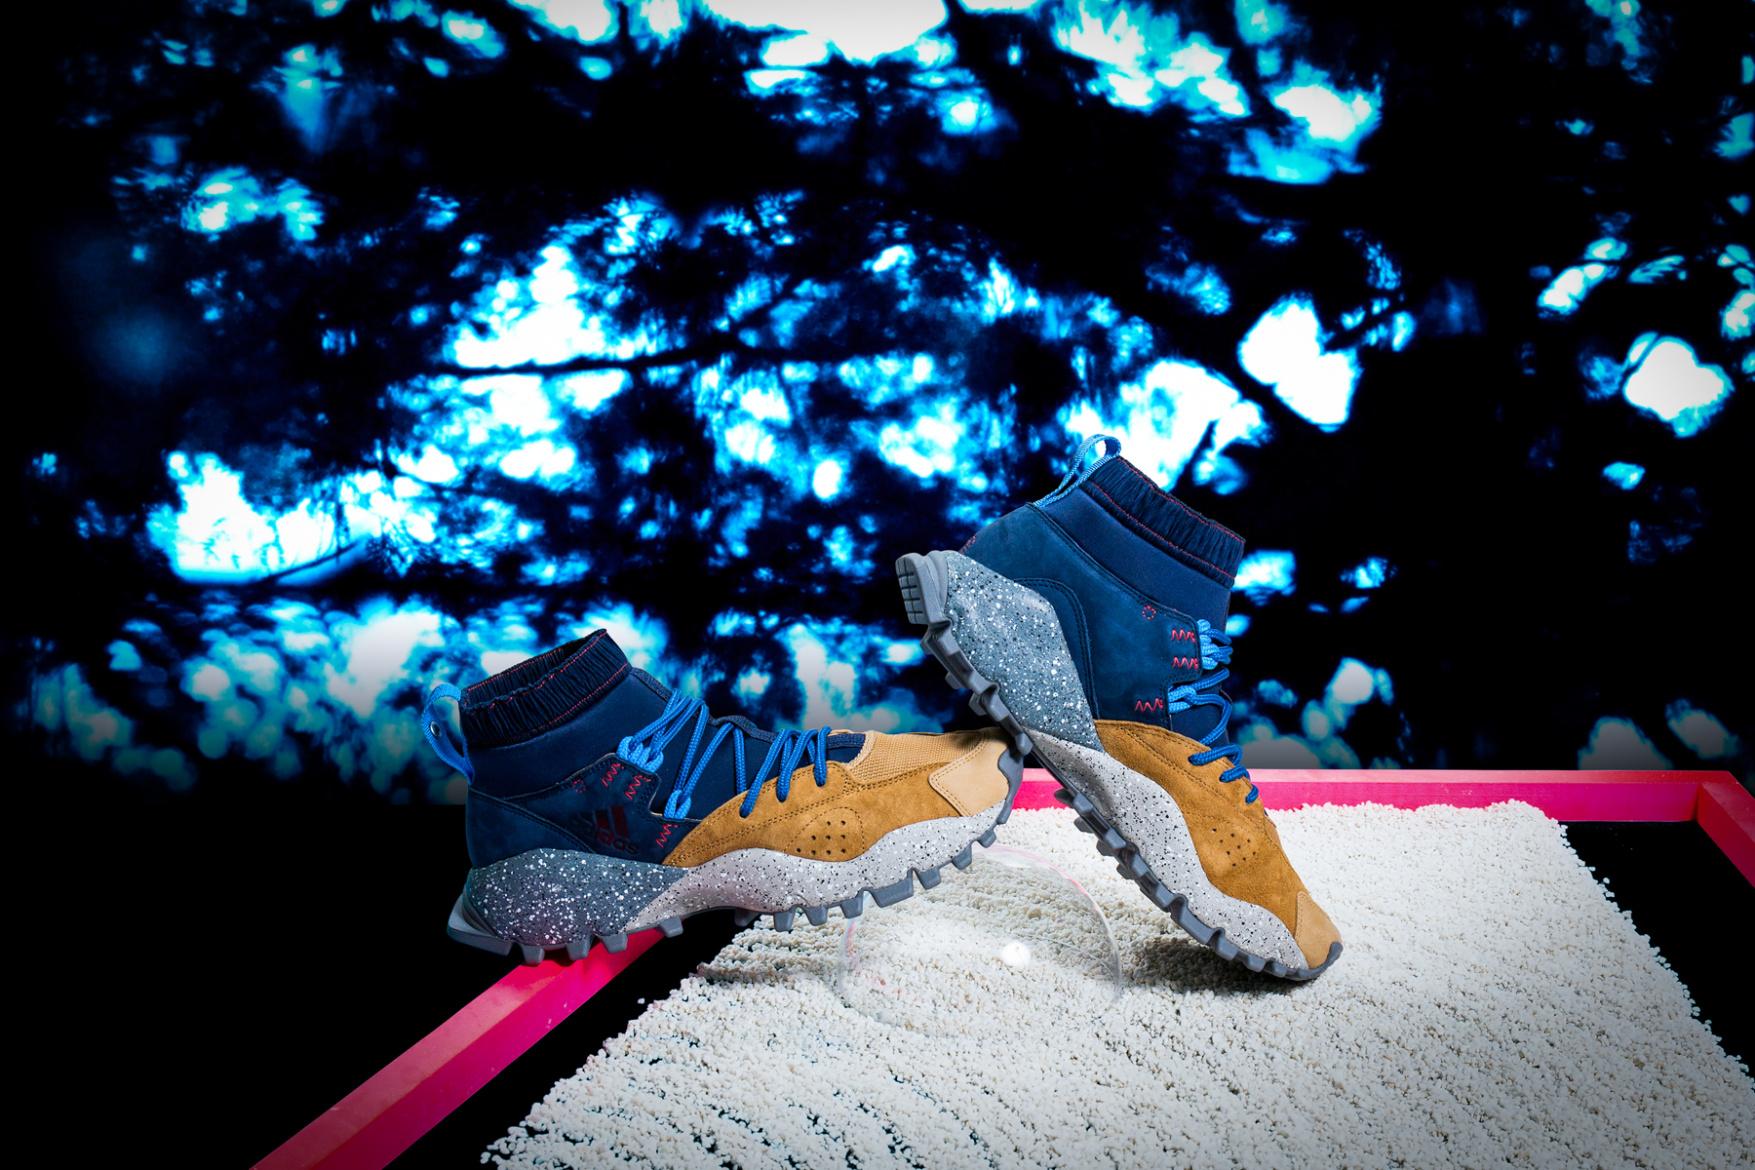 nsortium-mita-sneakers-seeulater-1